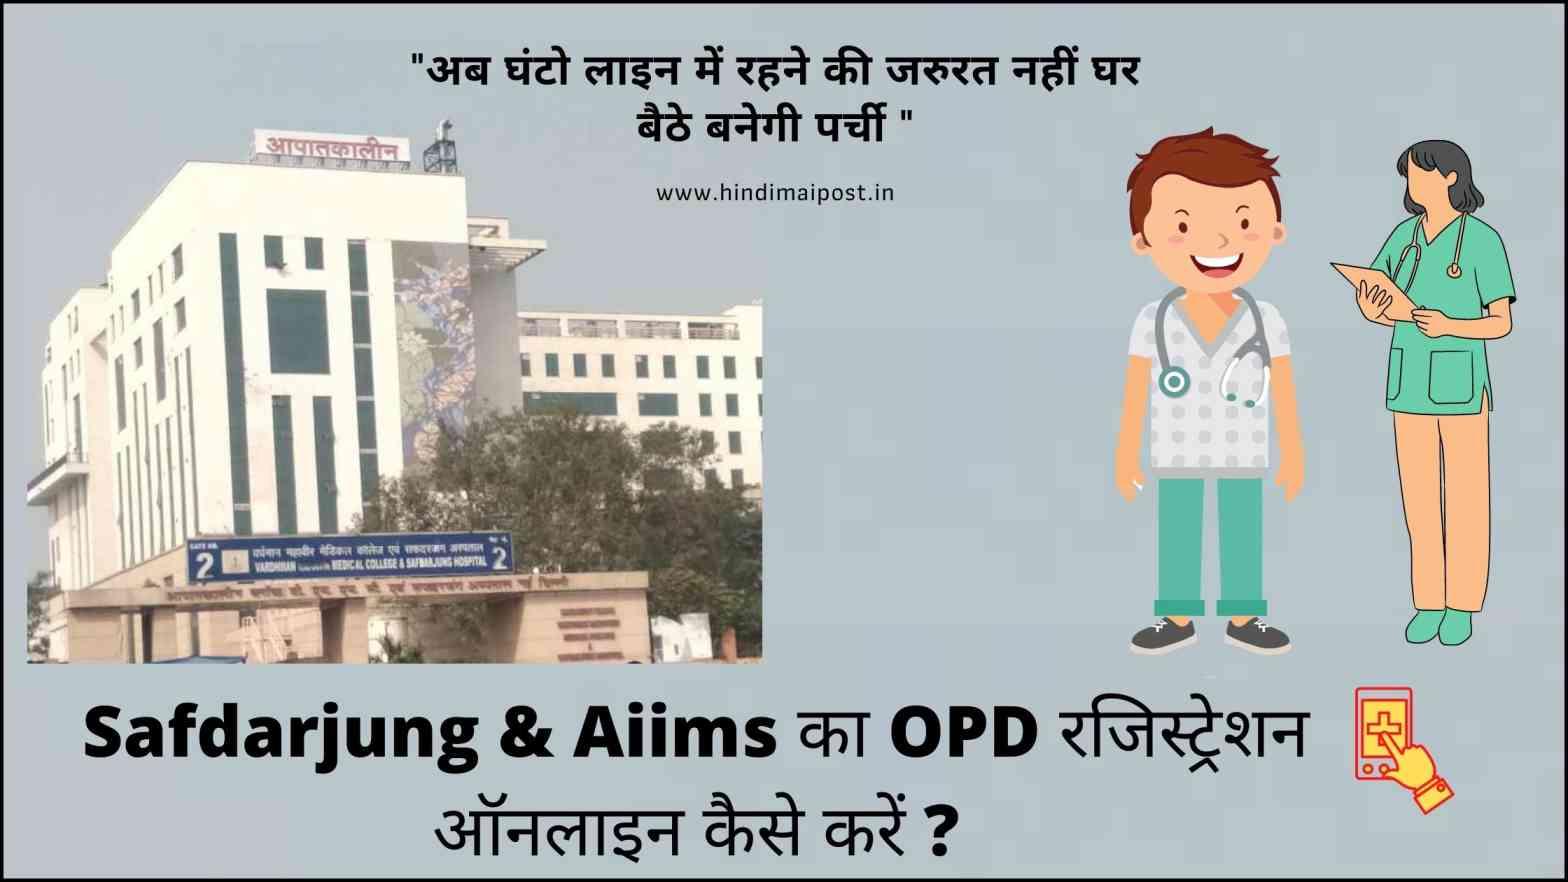 Safdarjung & Aiims OPD  registration in Hindi